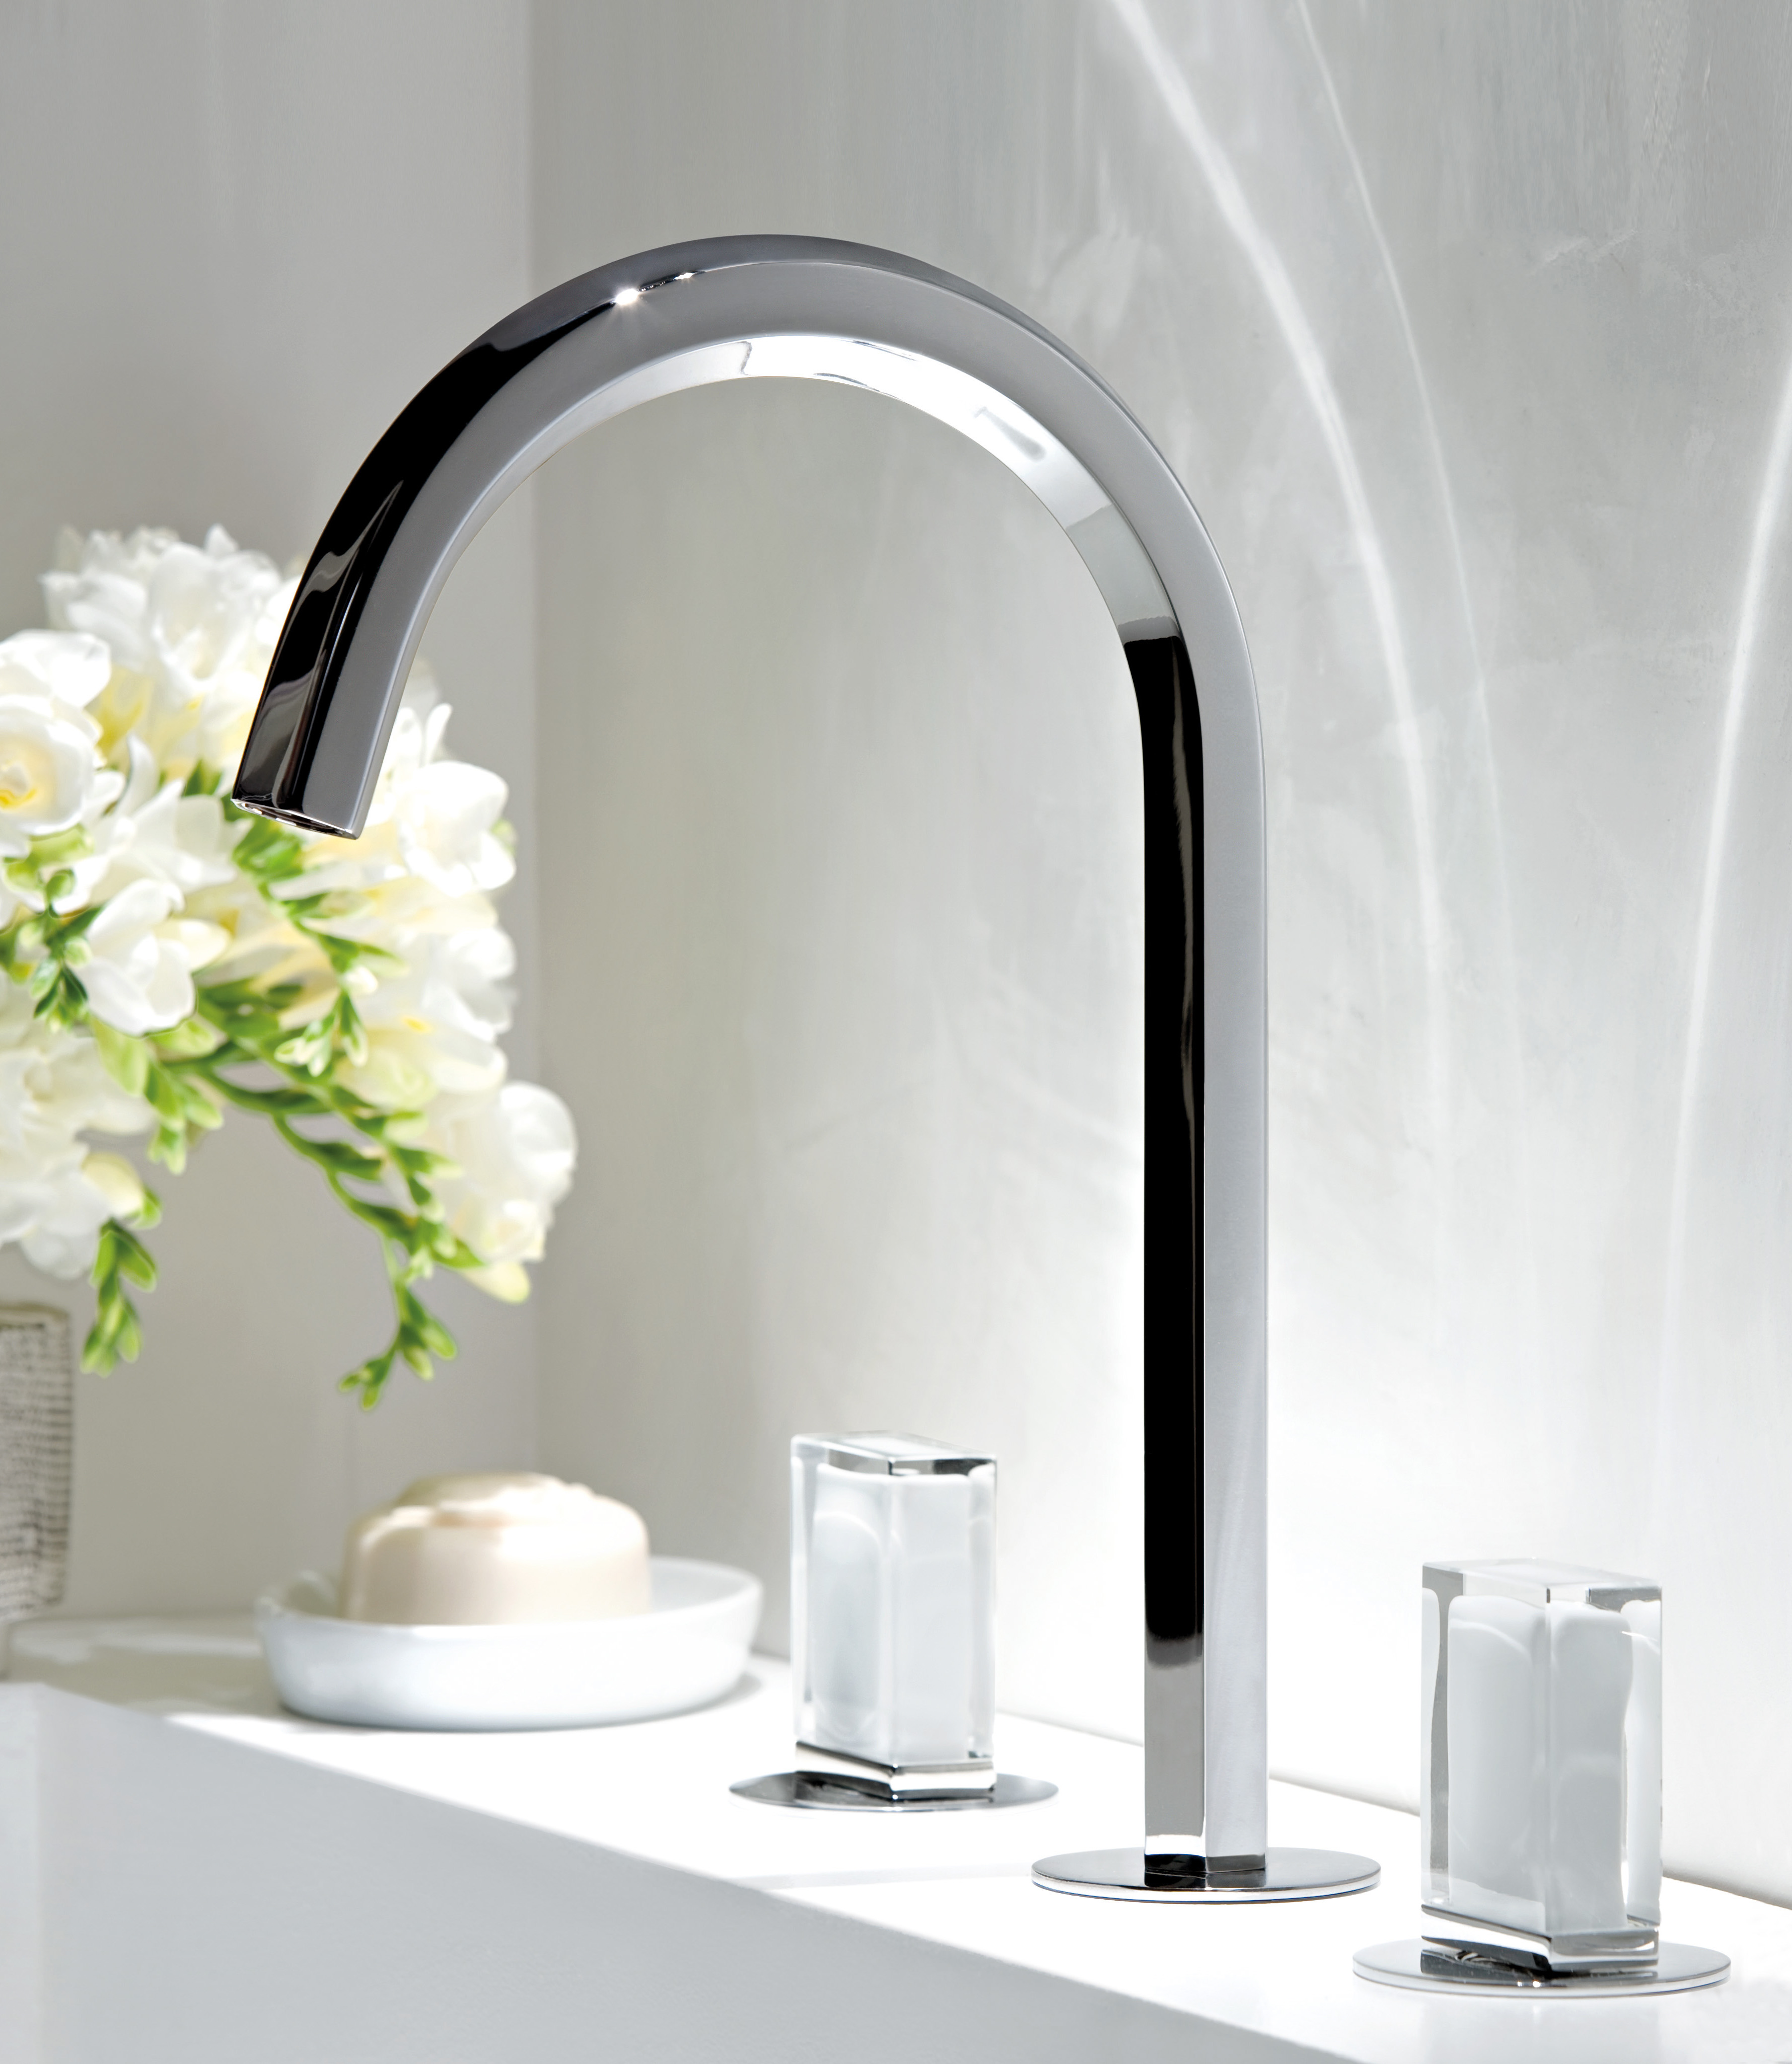 Outstanding Flow Bath And Kitchen Design Studio Glenside Pa Interior Design Ideas Gentotryabchikinfo